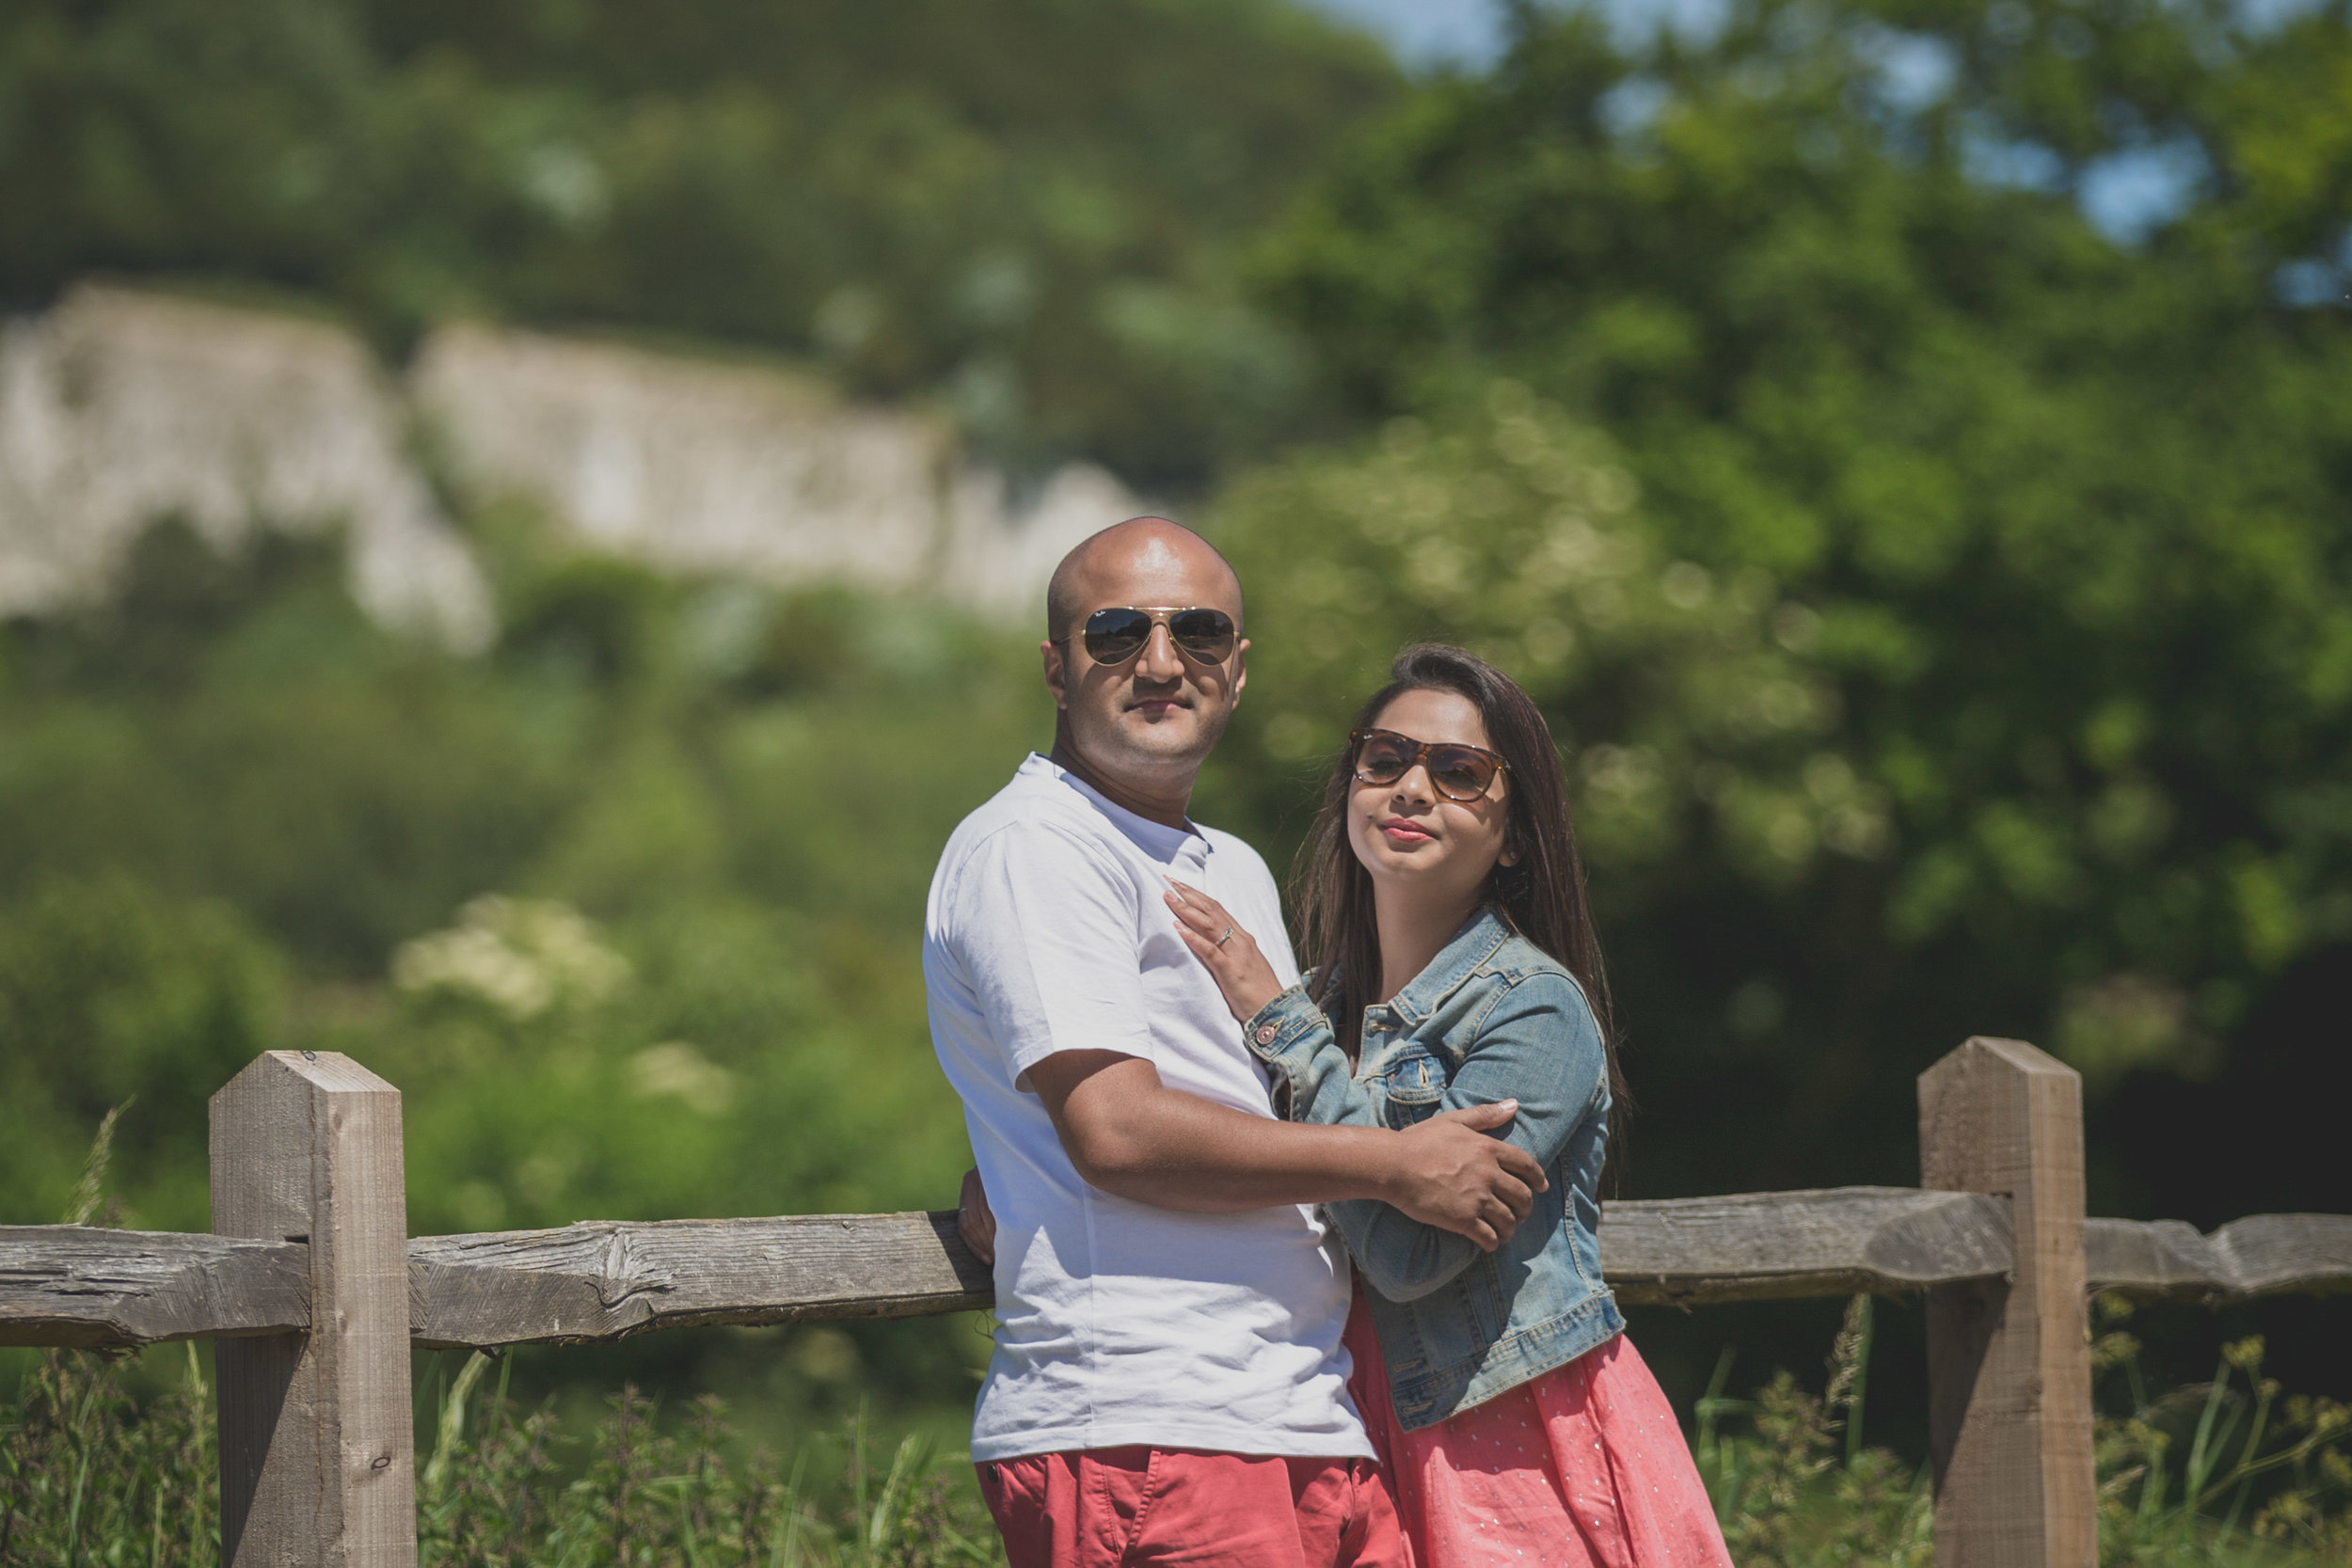 female-asian-wedding-photographer-surrey-hills-box-hill-pre-wedding-prewedding-engagement-photoshoot-shoot-natalia-smith-photography-8.jpg